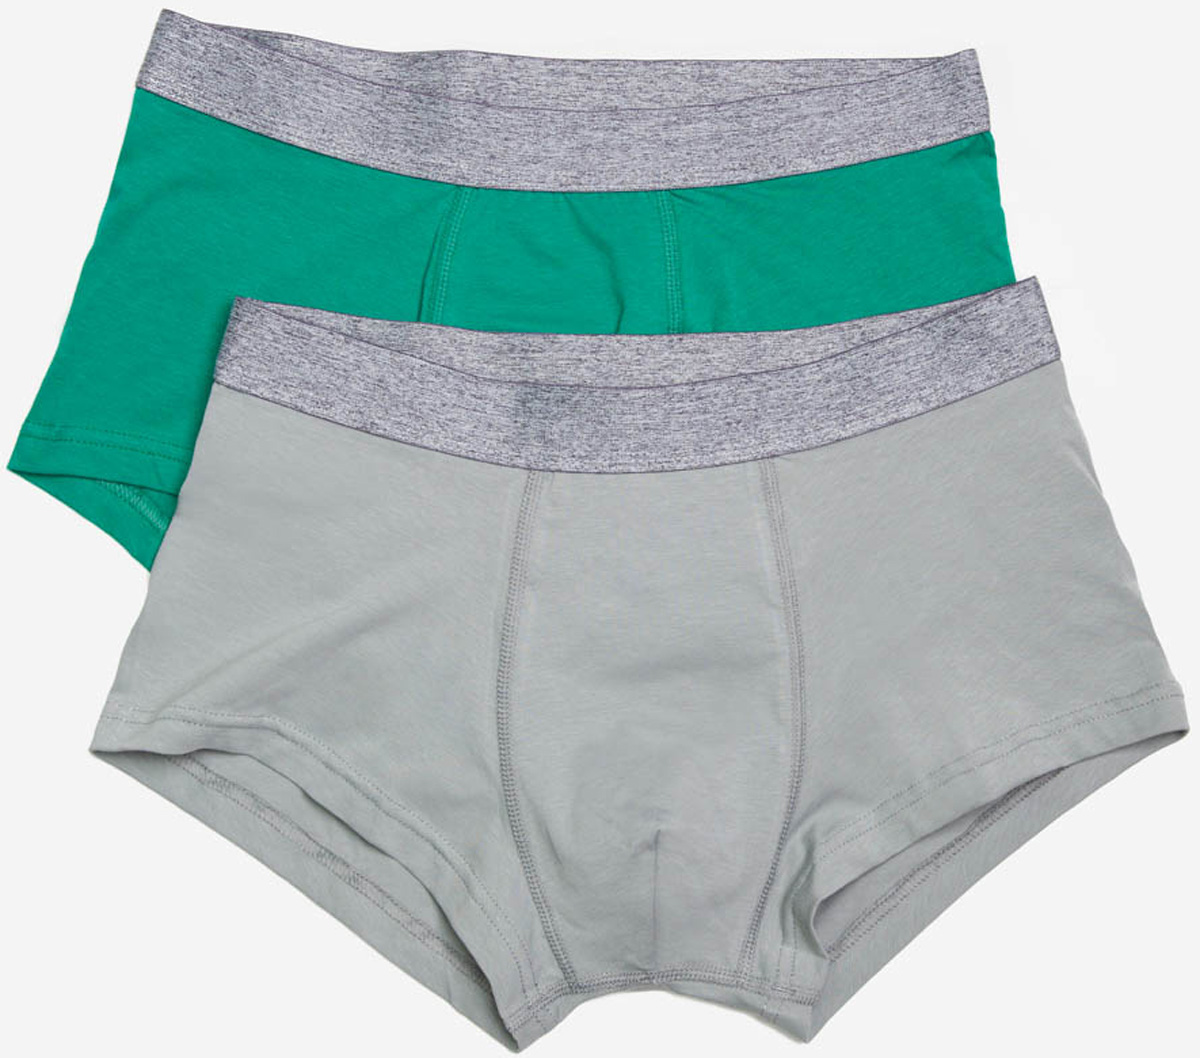 Трусы Mark Formelle sexy scorpion printed ice fabric boxer briefs